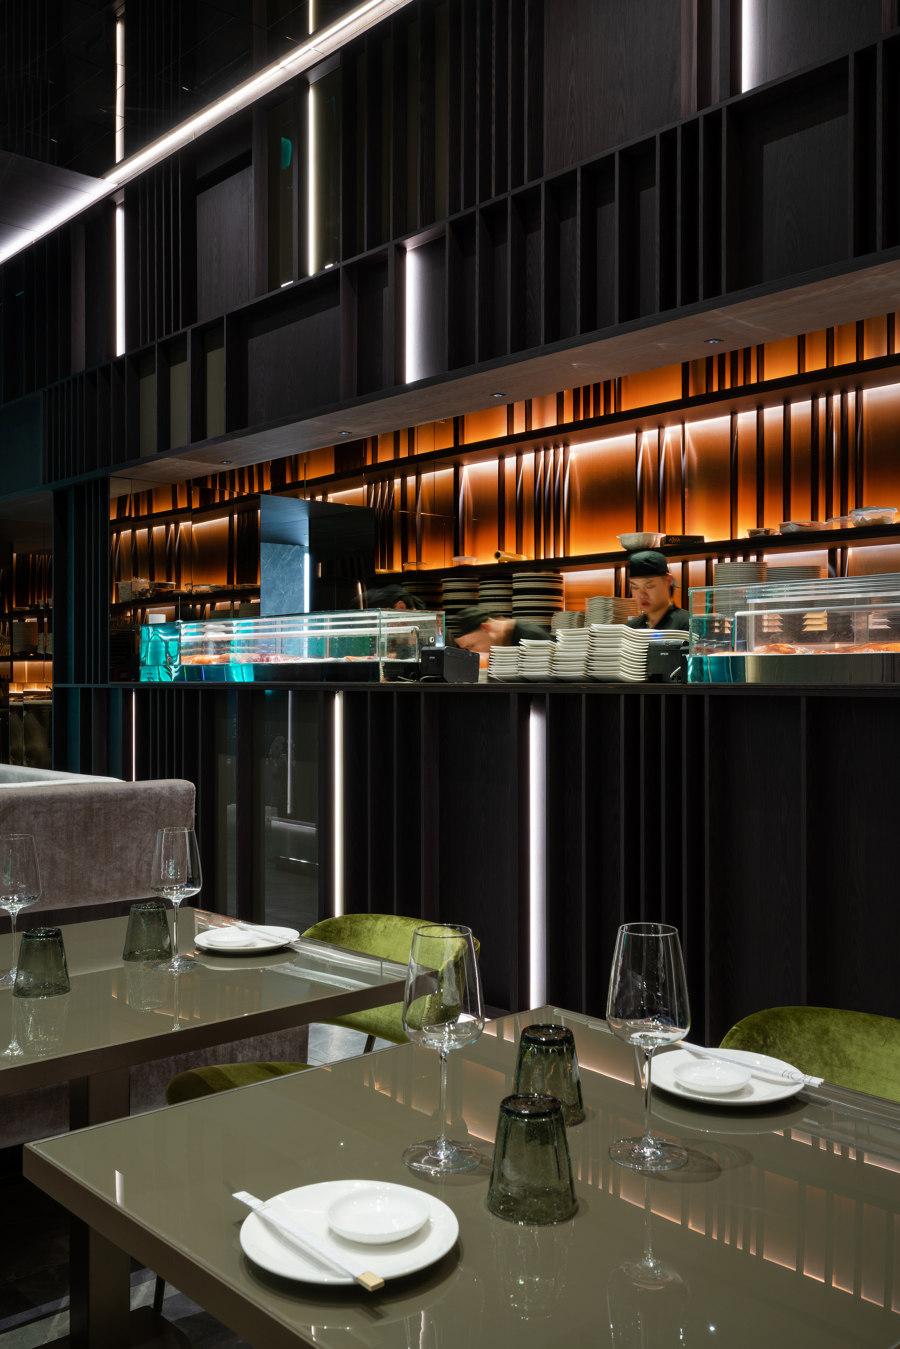 Moya by LAI STUDIO, Maurizio Lai | Restaurant interiors